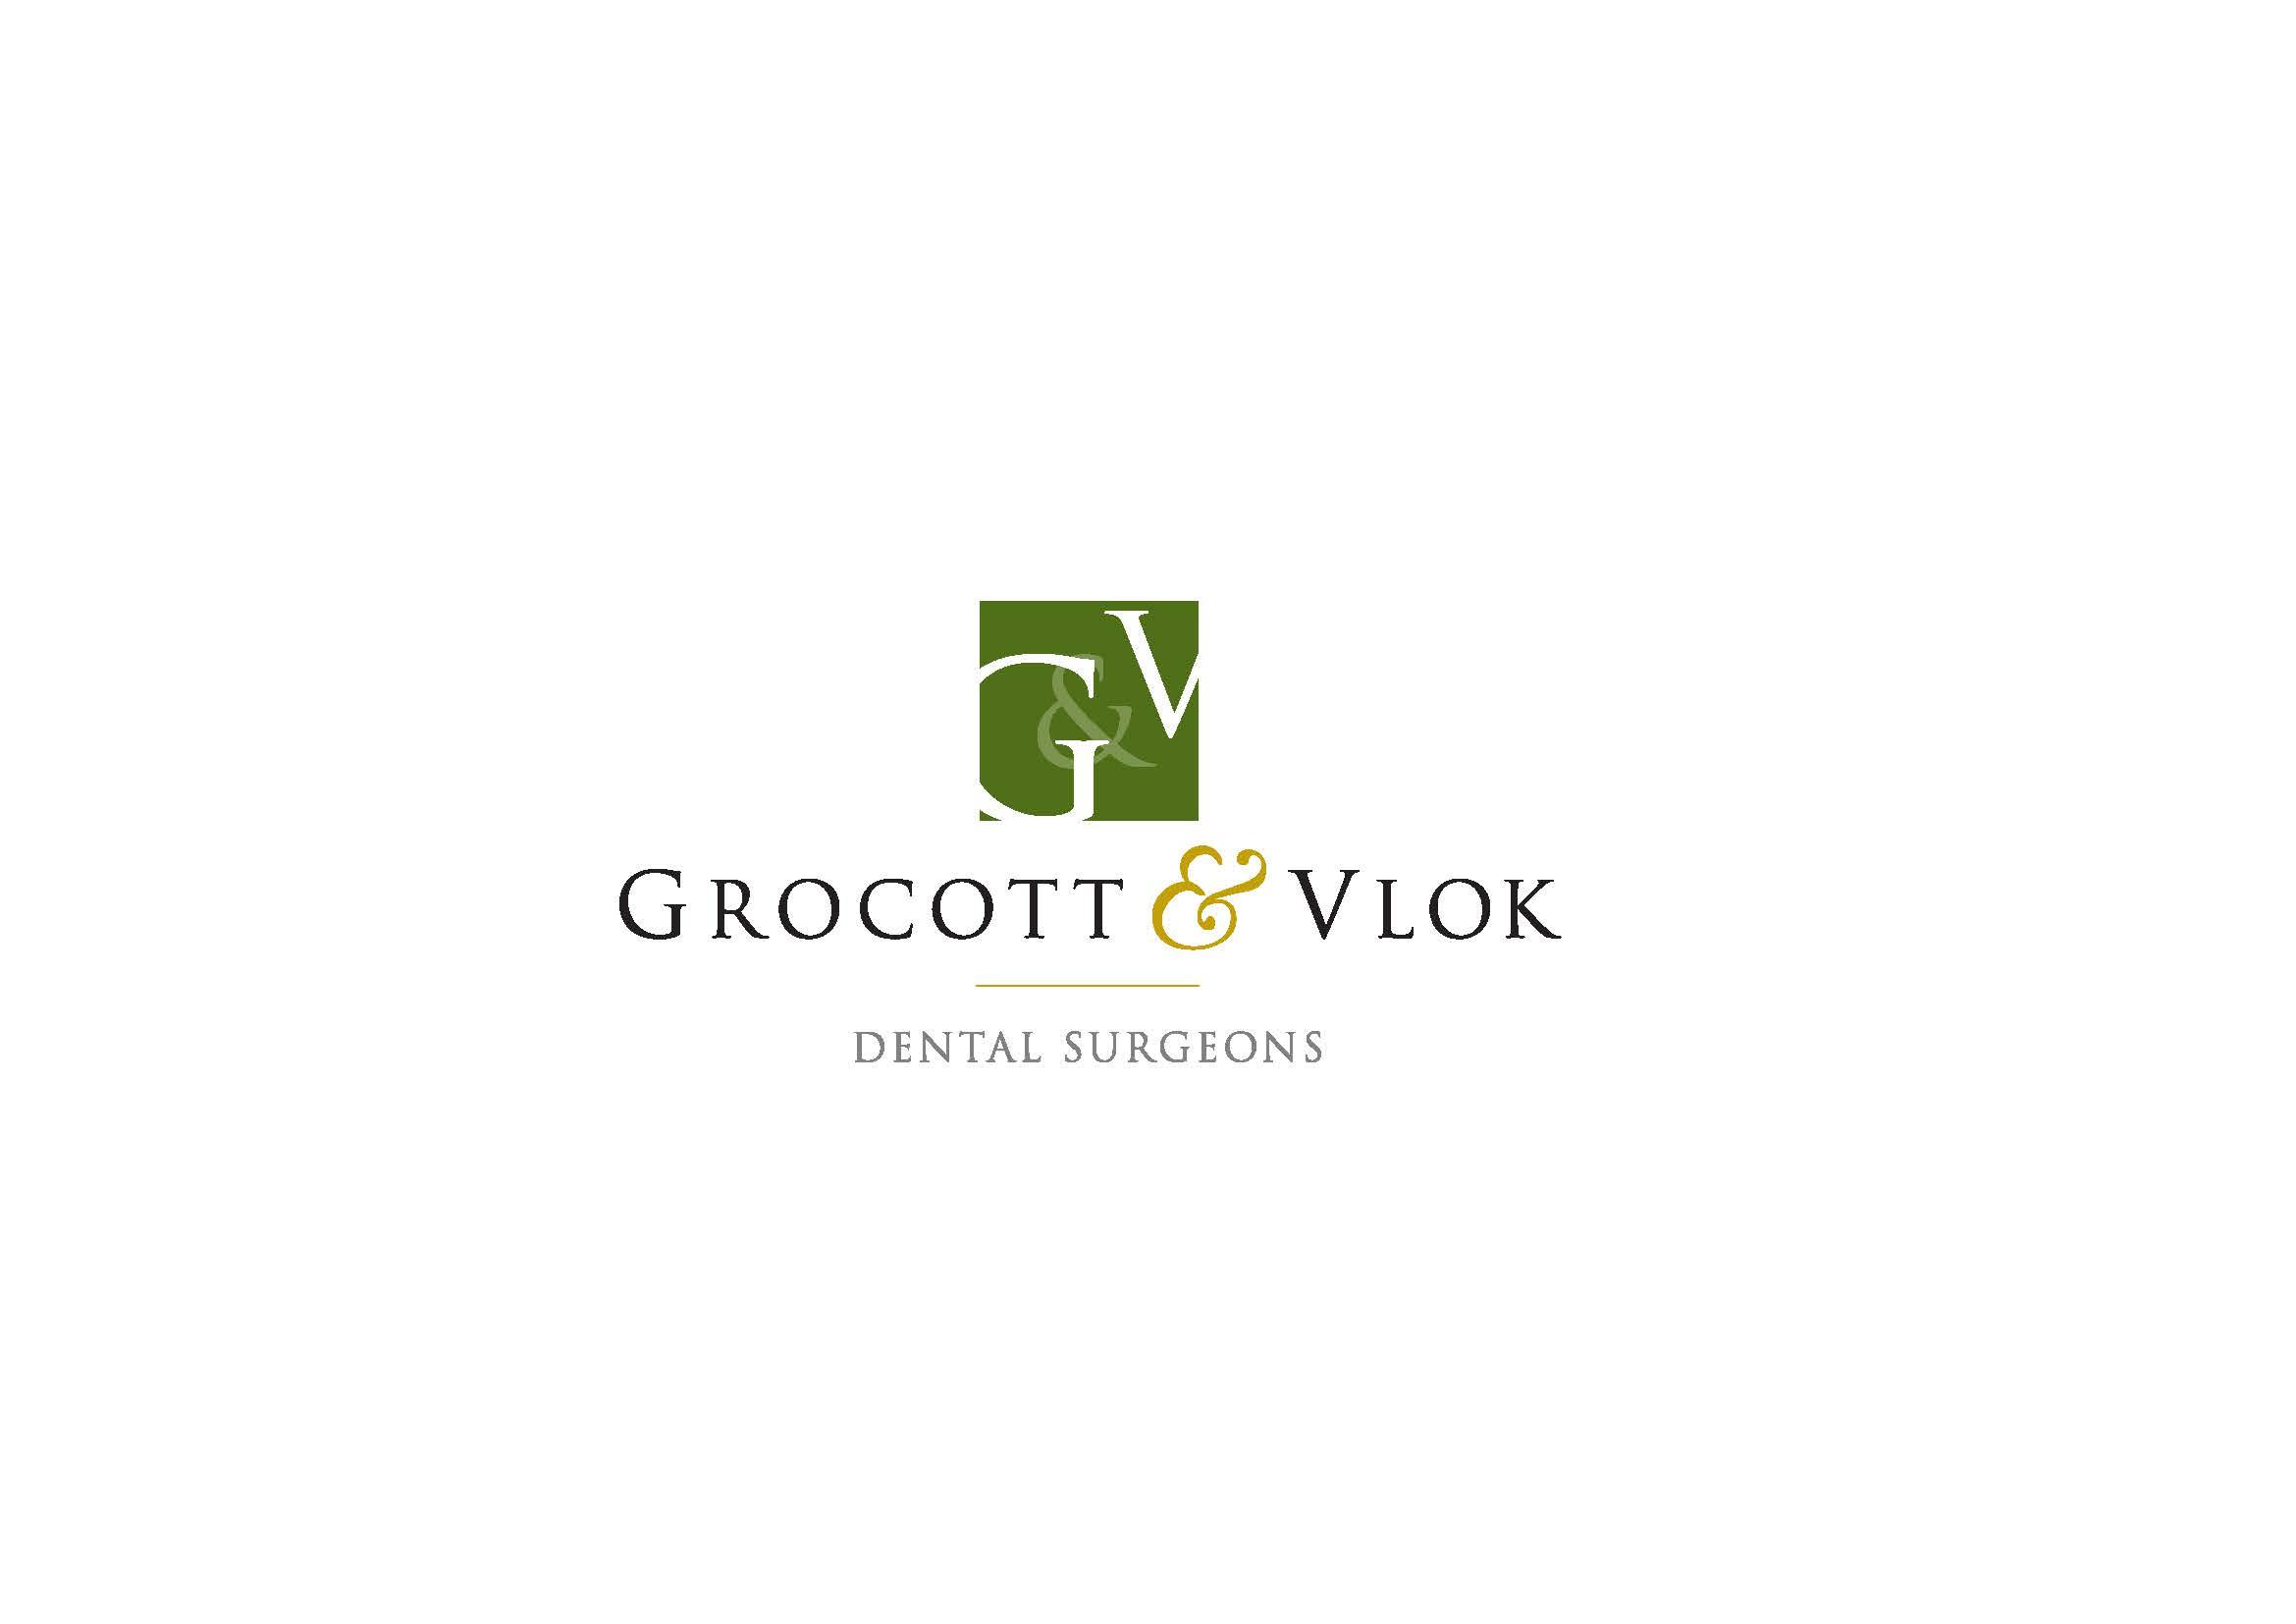 Grocott & Vlok Dental Practice